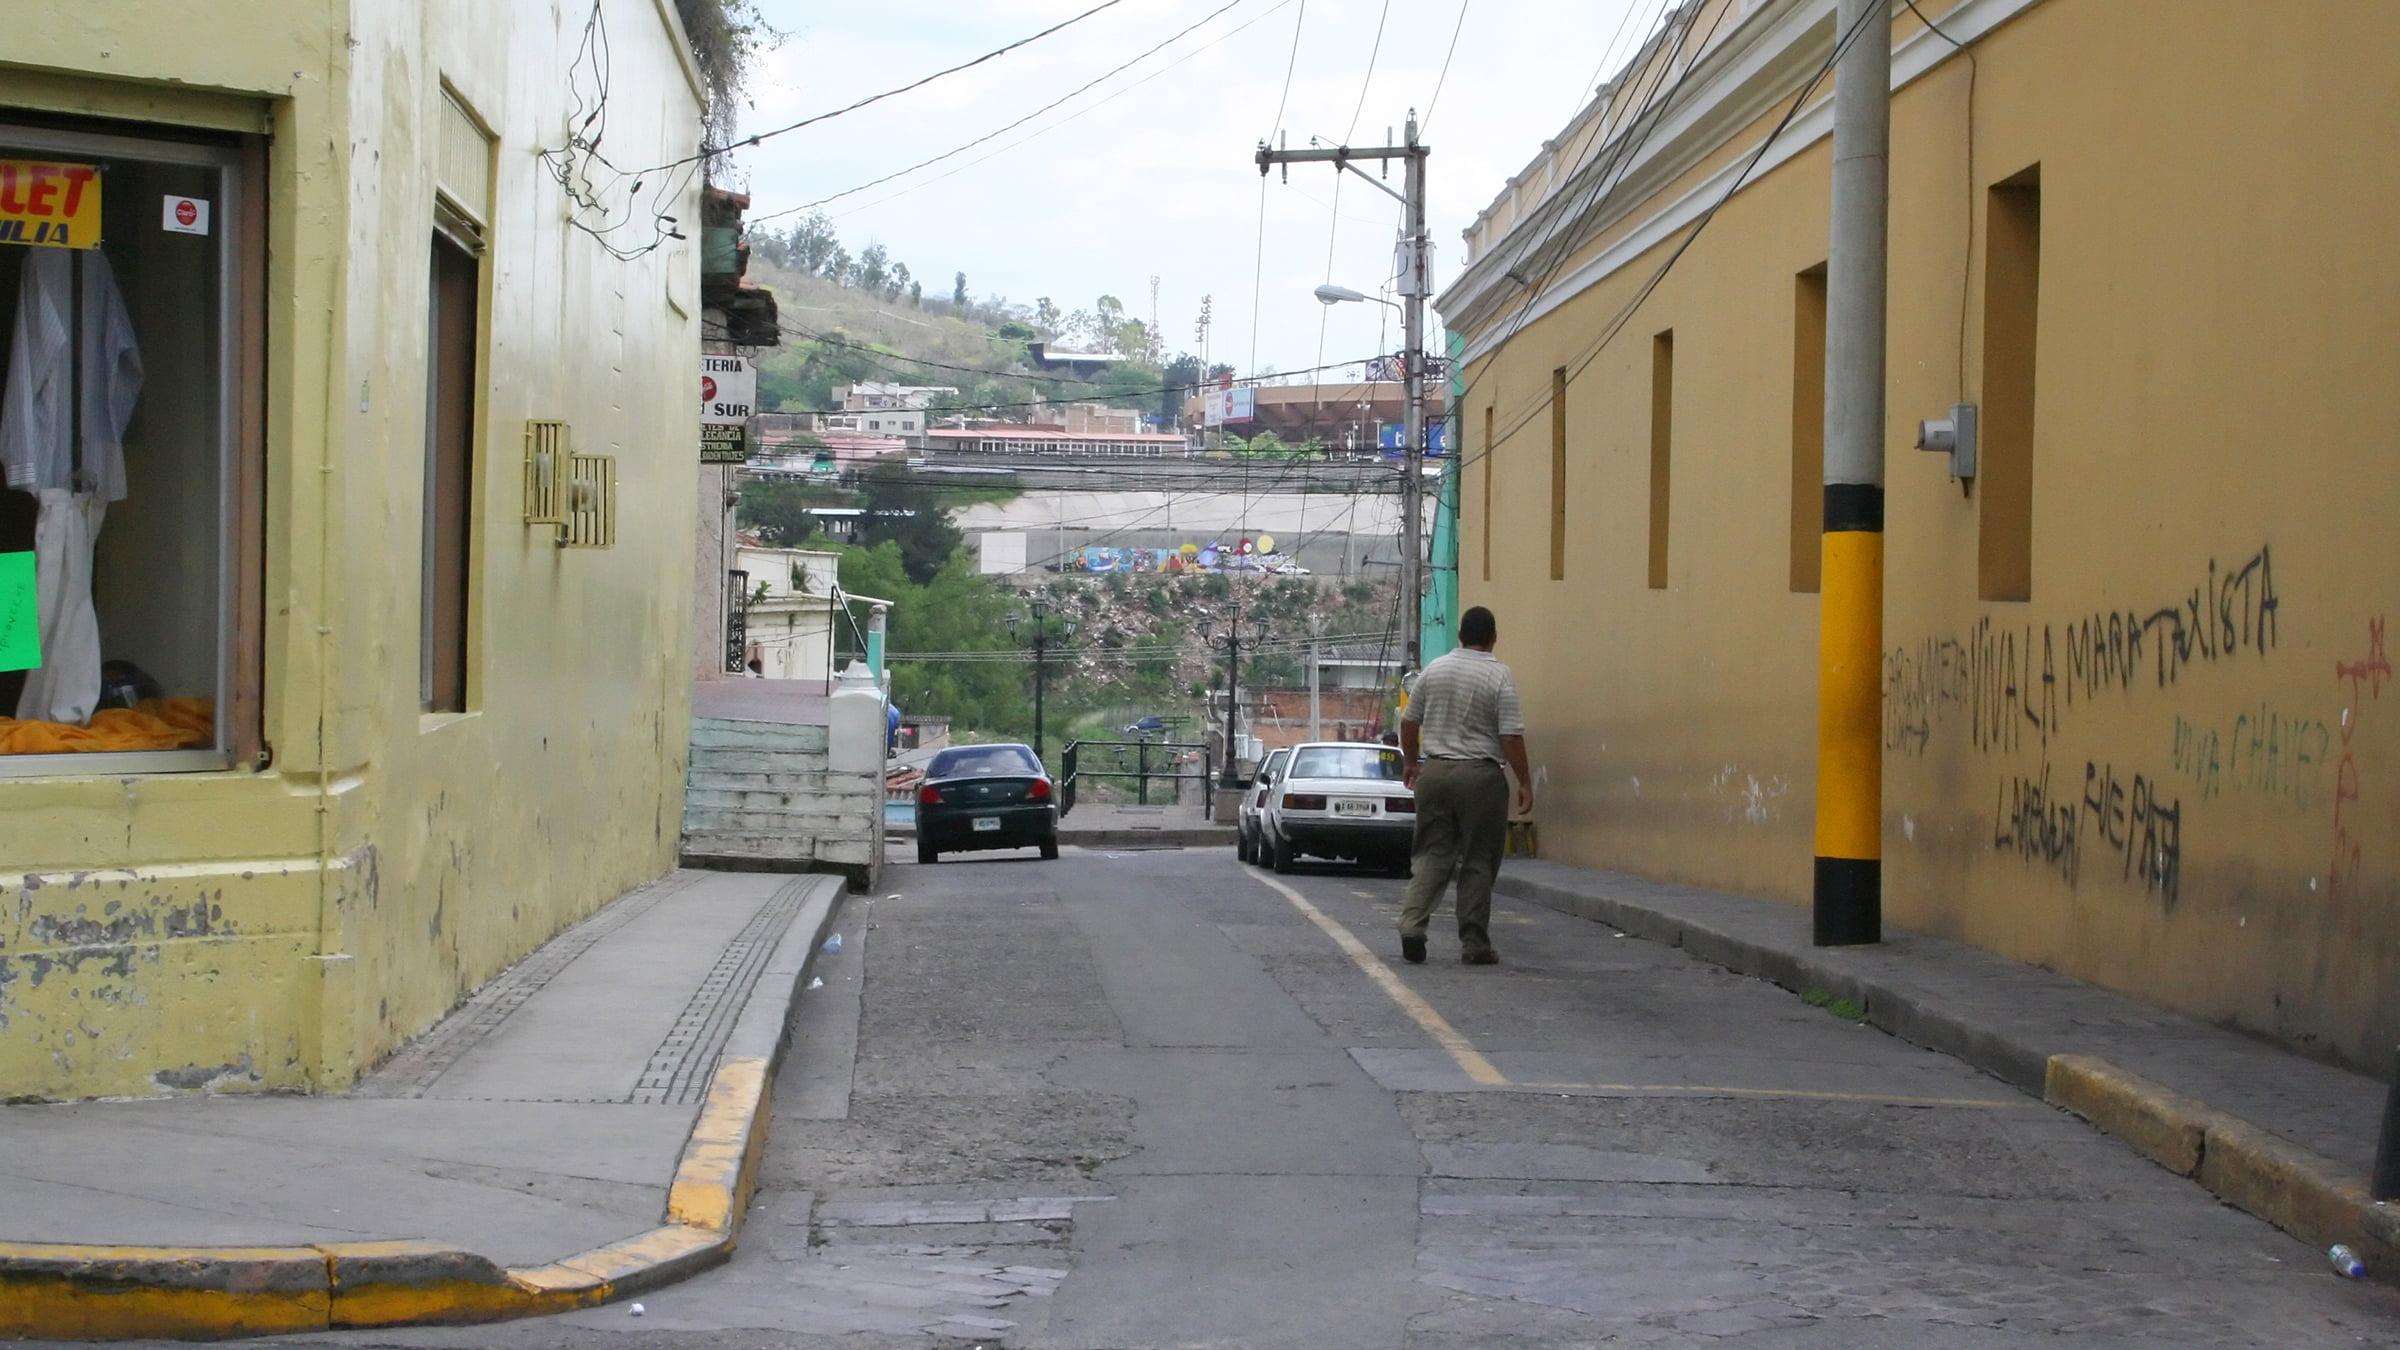 http://www.viajejet.com/wp-content/viajes/honduras.jpg